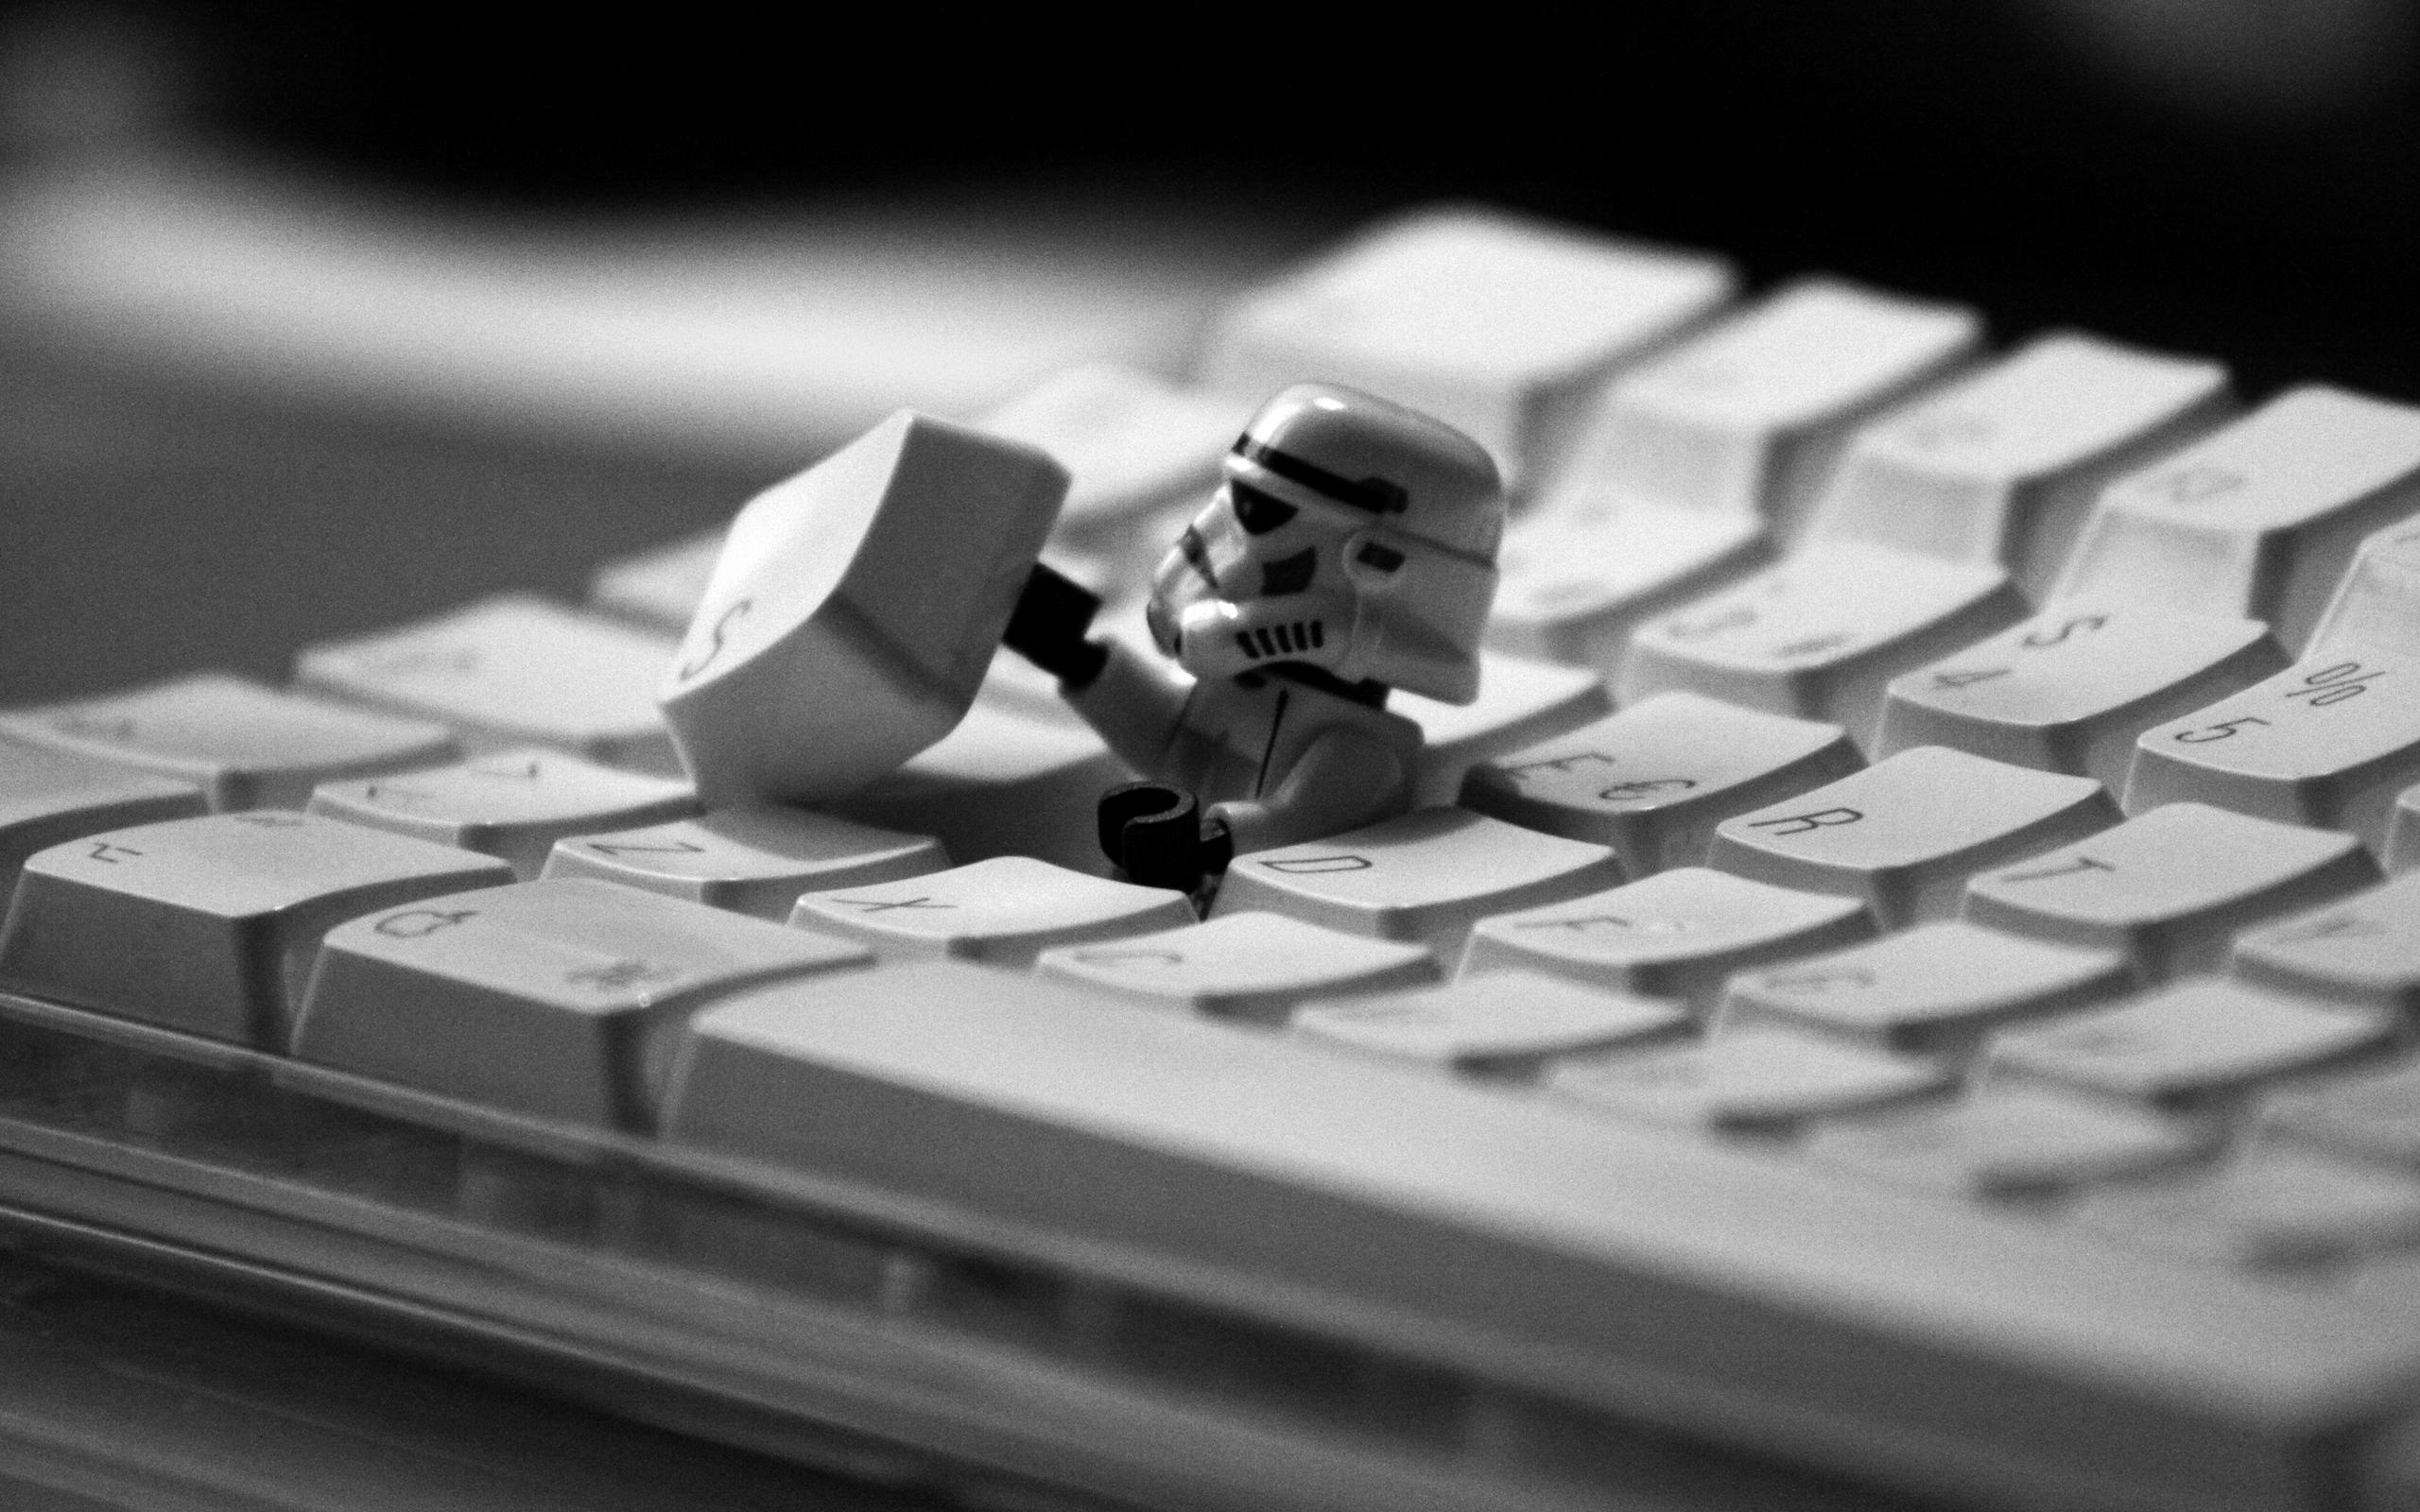 Star Wars Lego Stormtroopers